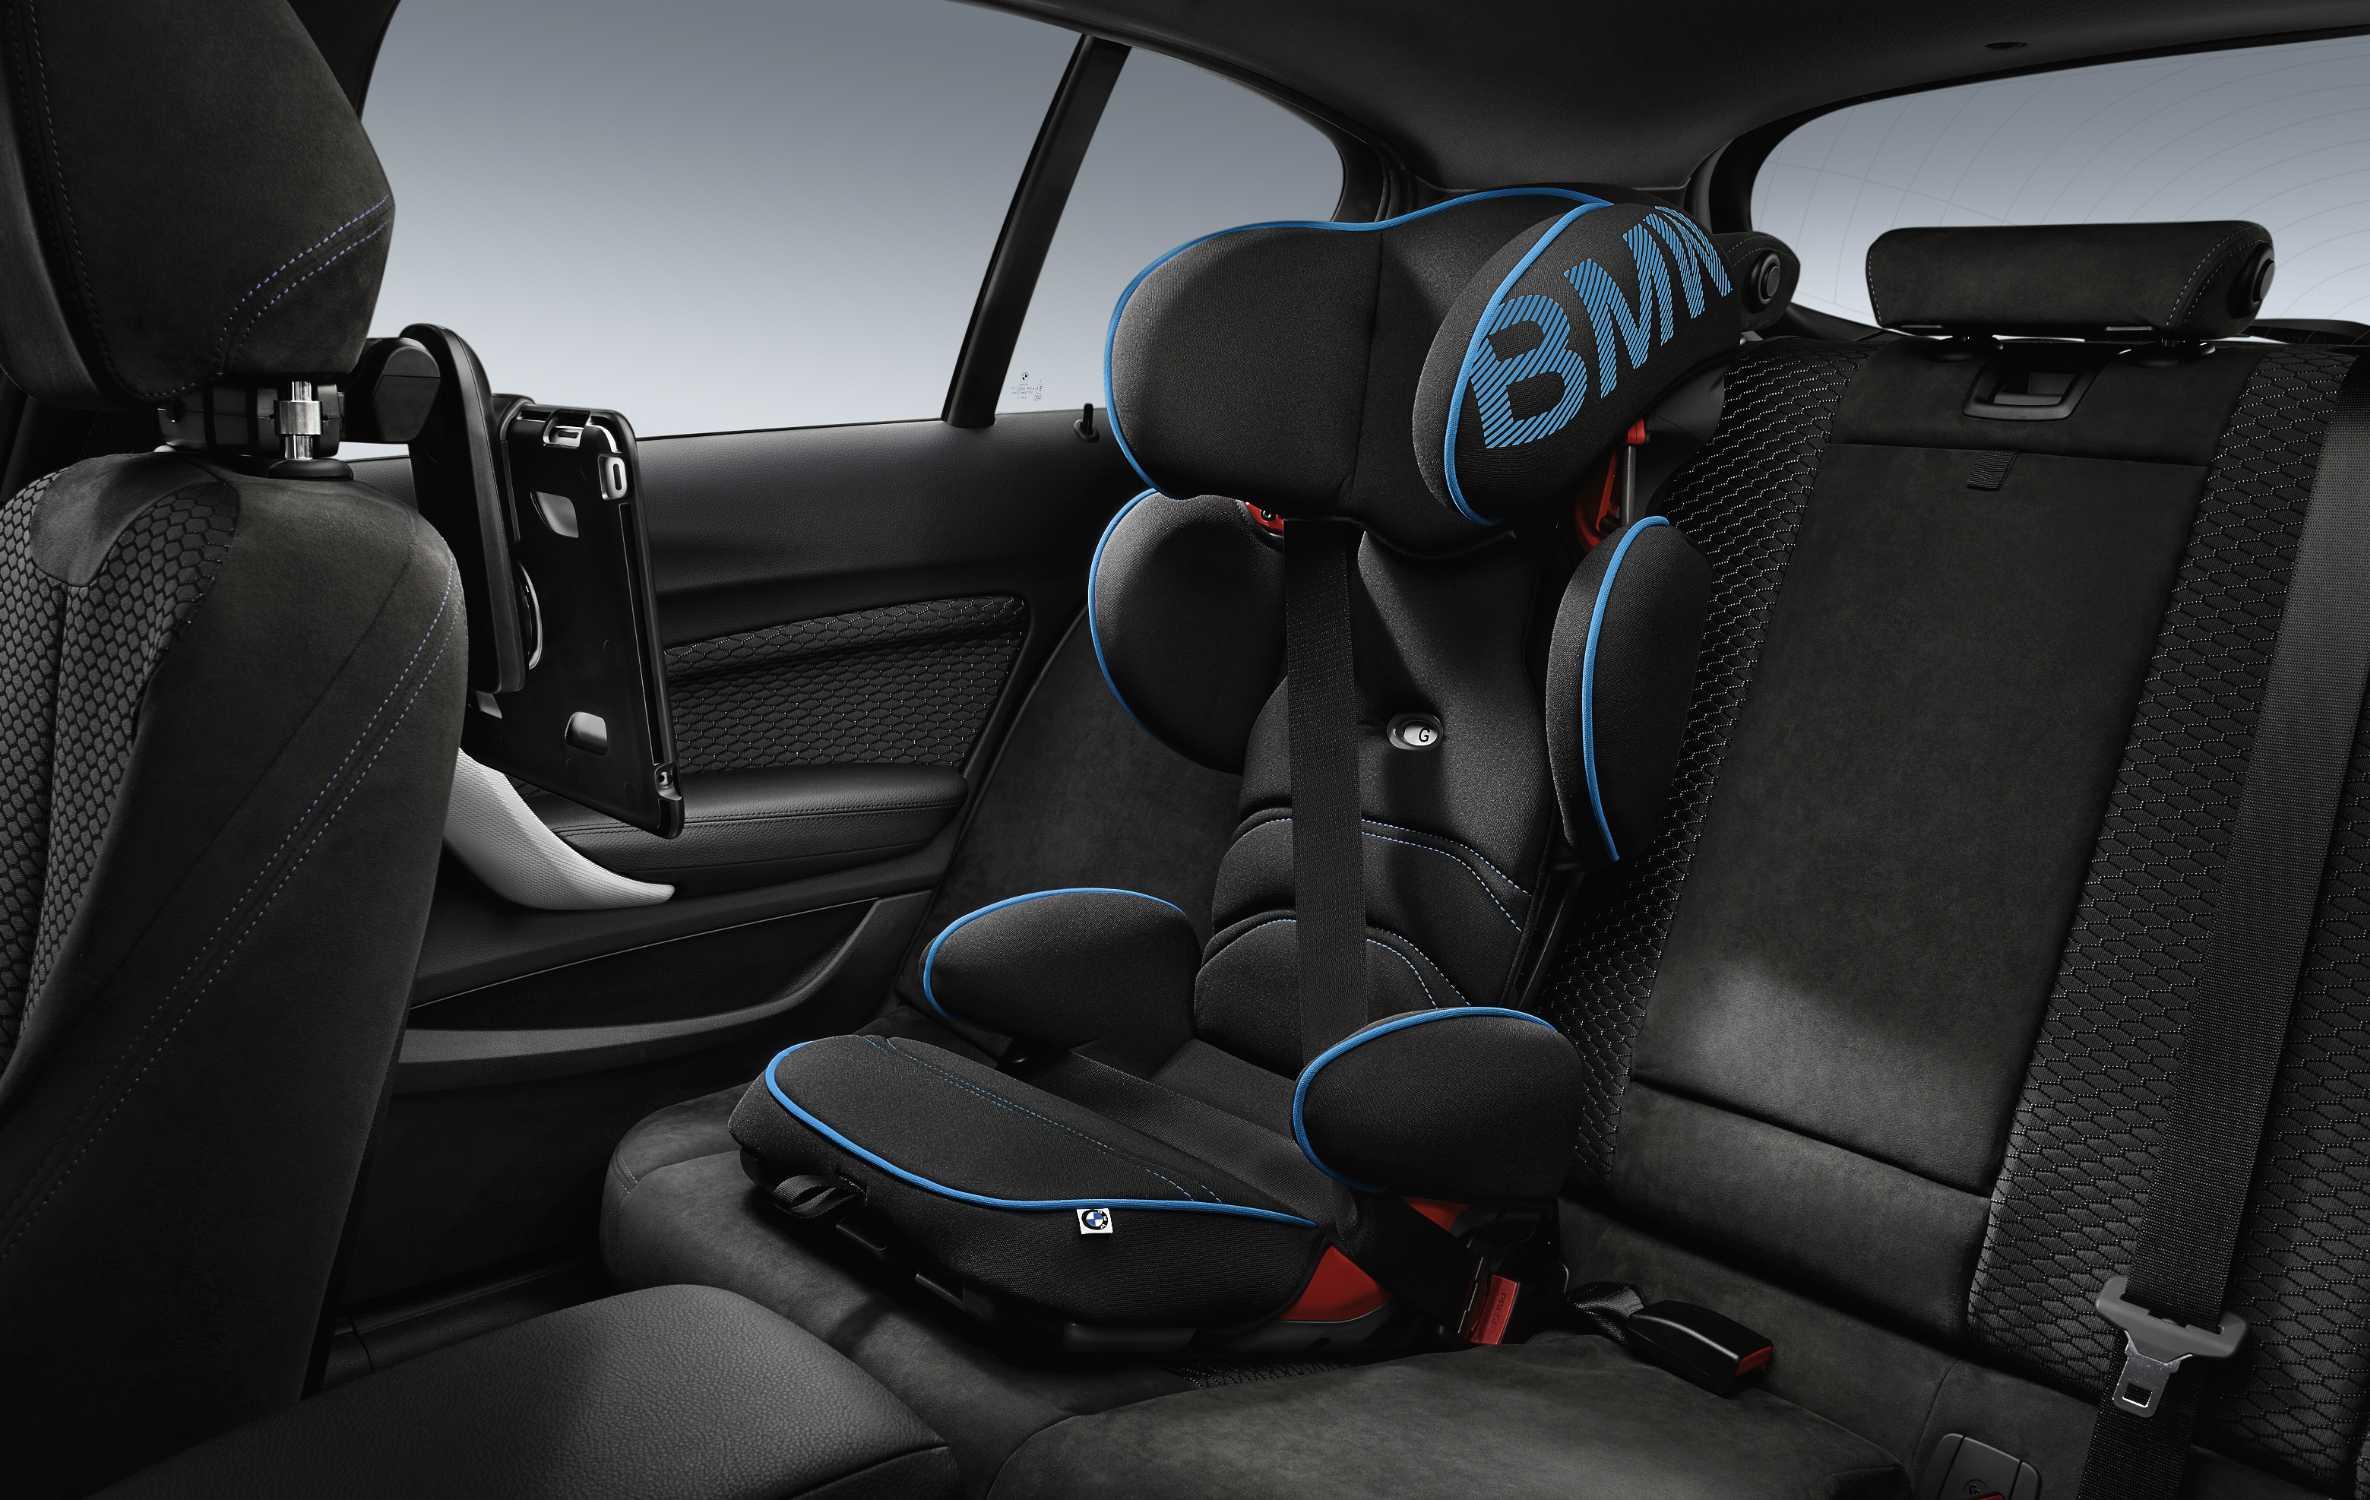 bmw junior seat 2 3 black blue and travel comfort ipad. Black Bedroom Furniture Sets. Home Design Ideas